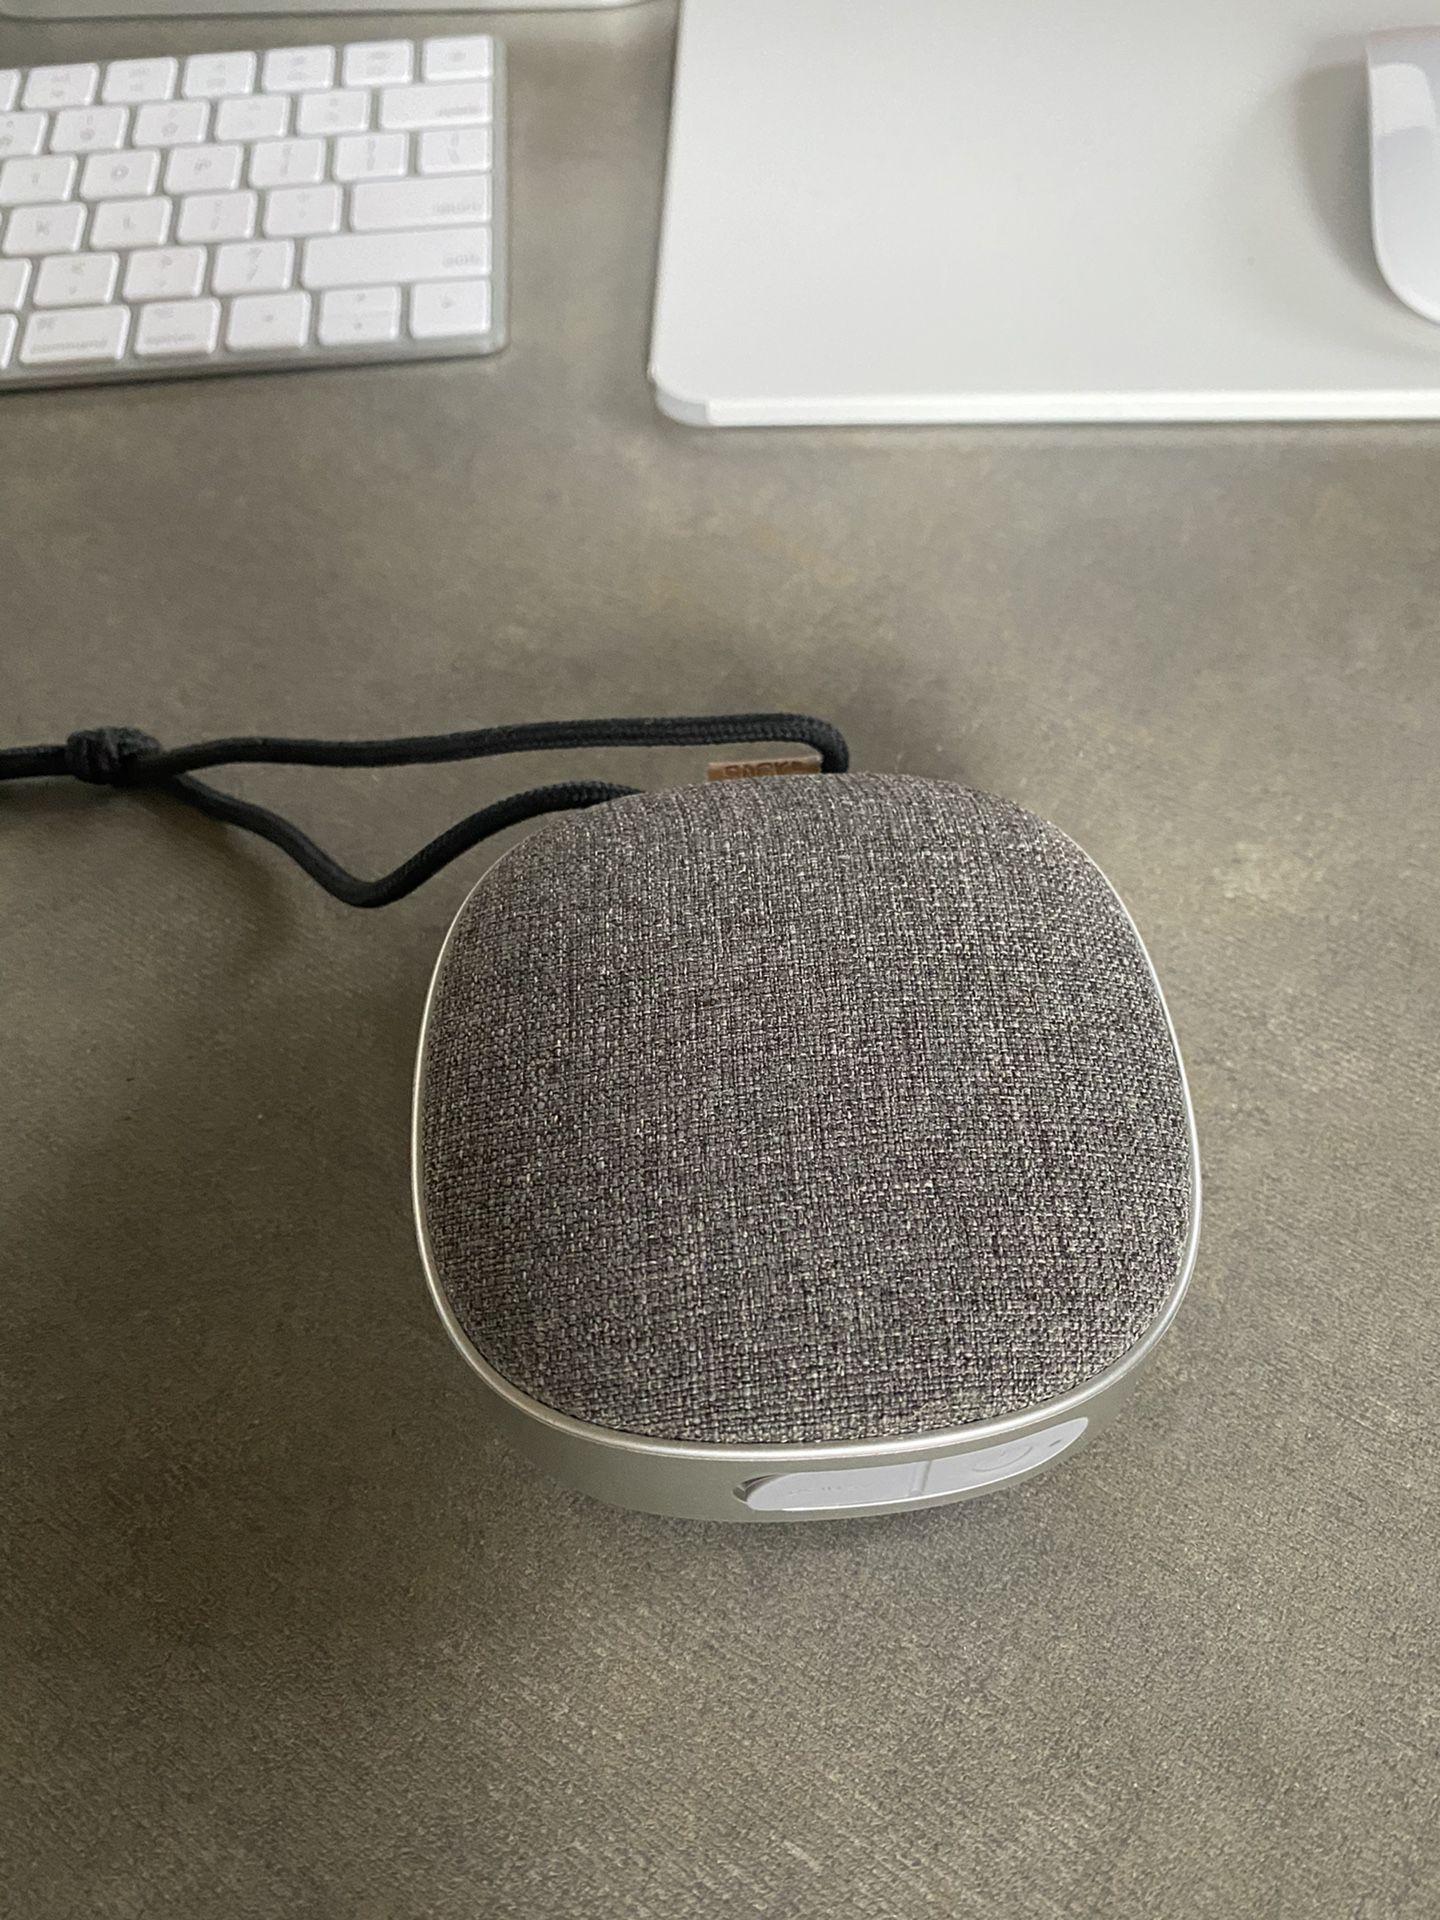 SACit WOOFit Go Bluetooth Speaker